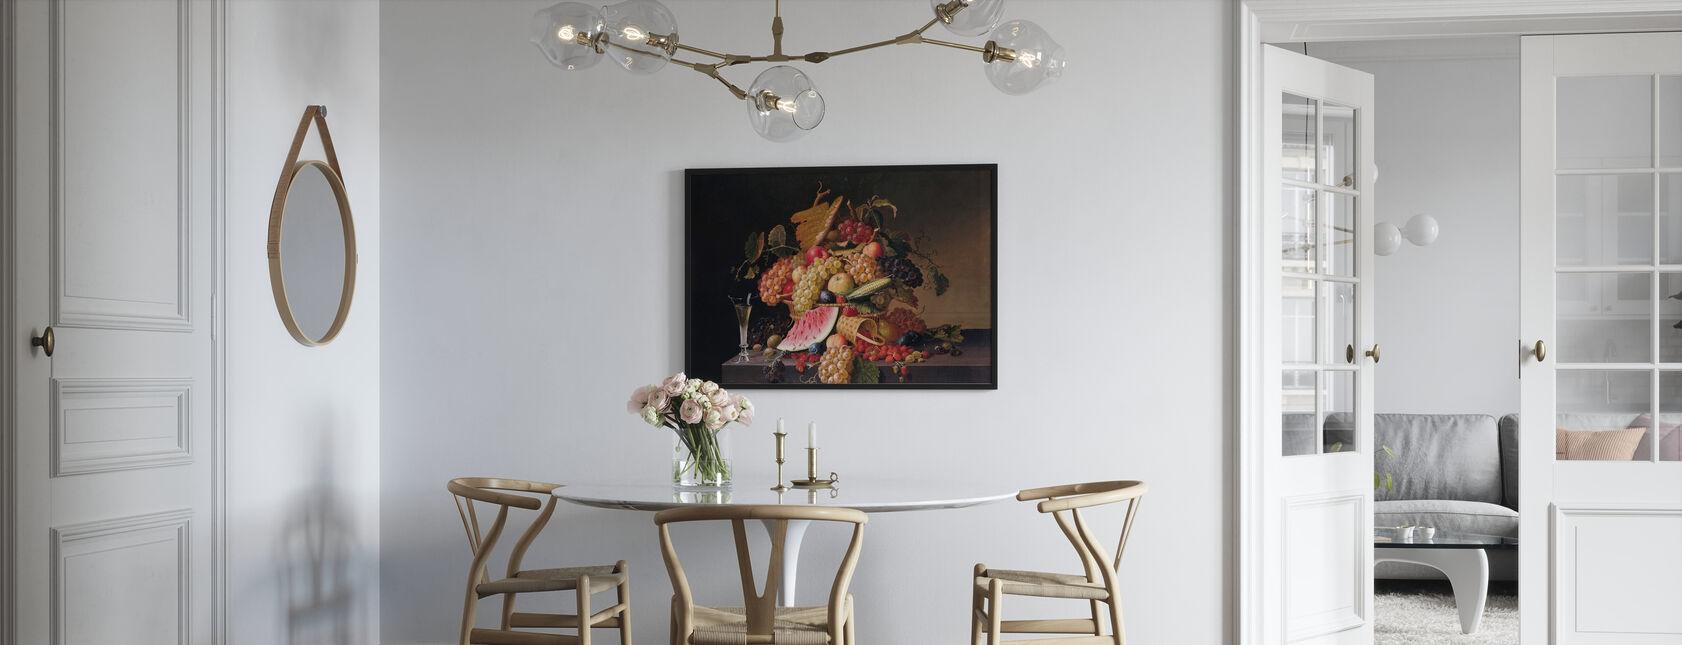 Abundance of Summer - Paul Lacroix - Framed print - Kitchen